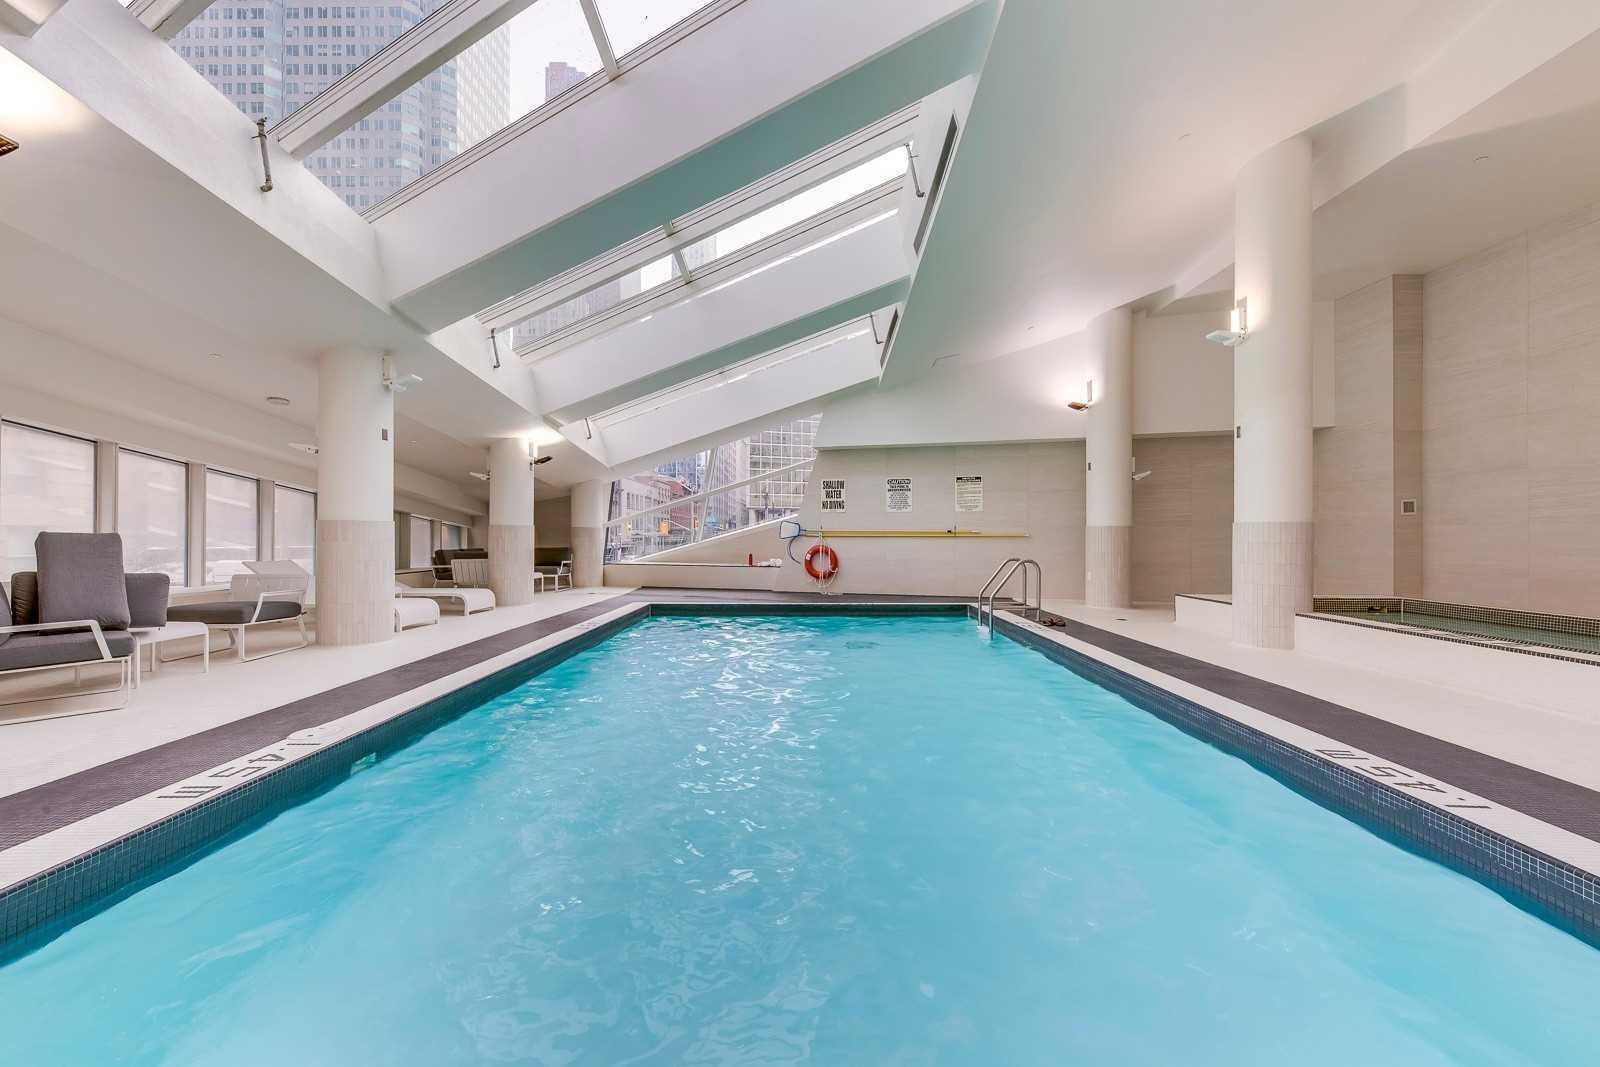 Indoor swimming pool amenity at L Tower Condos.